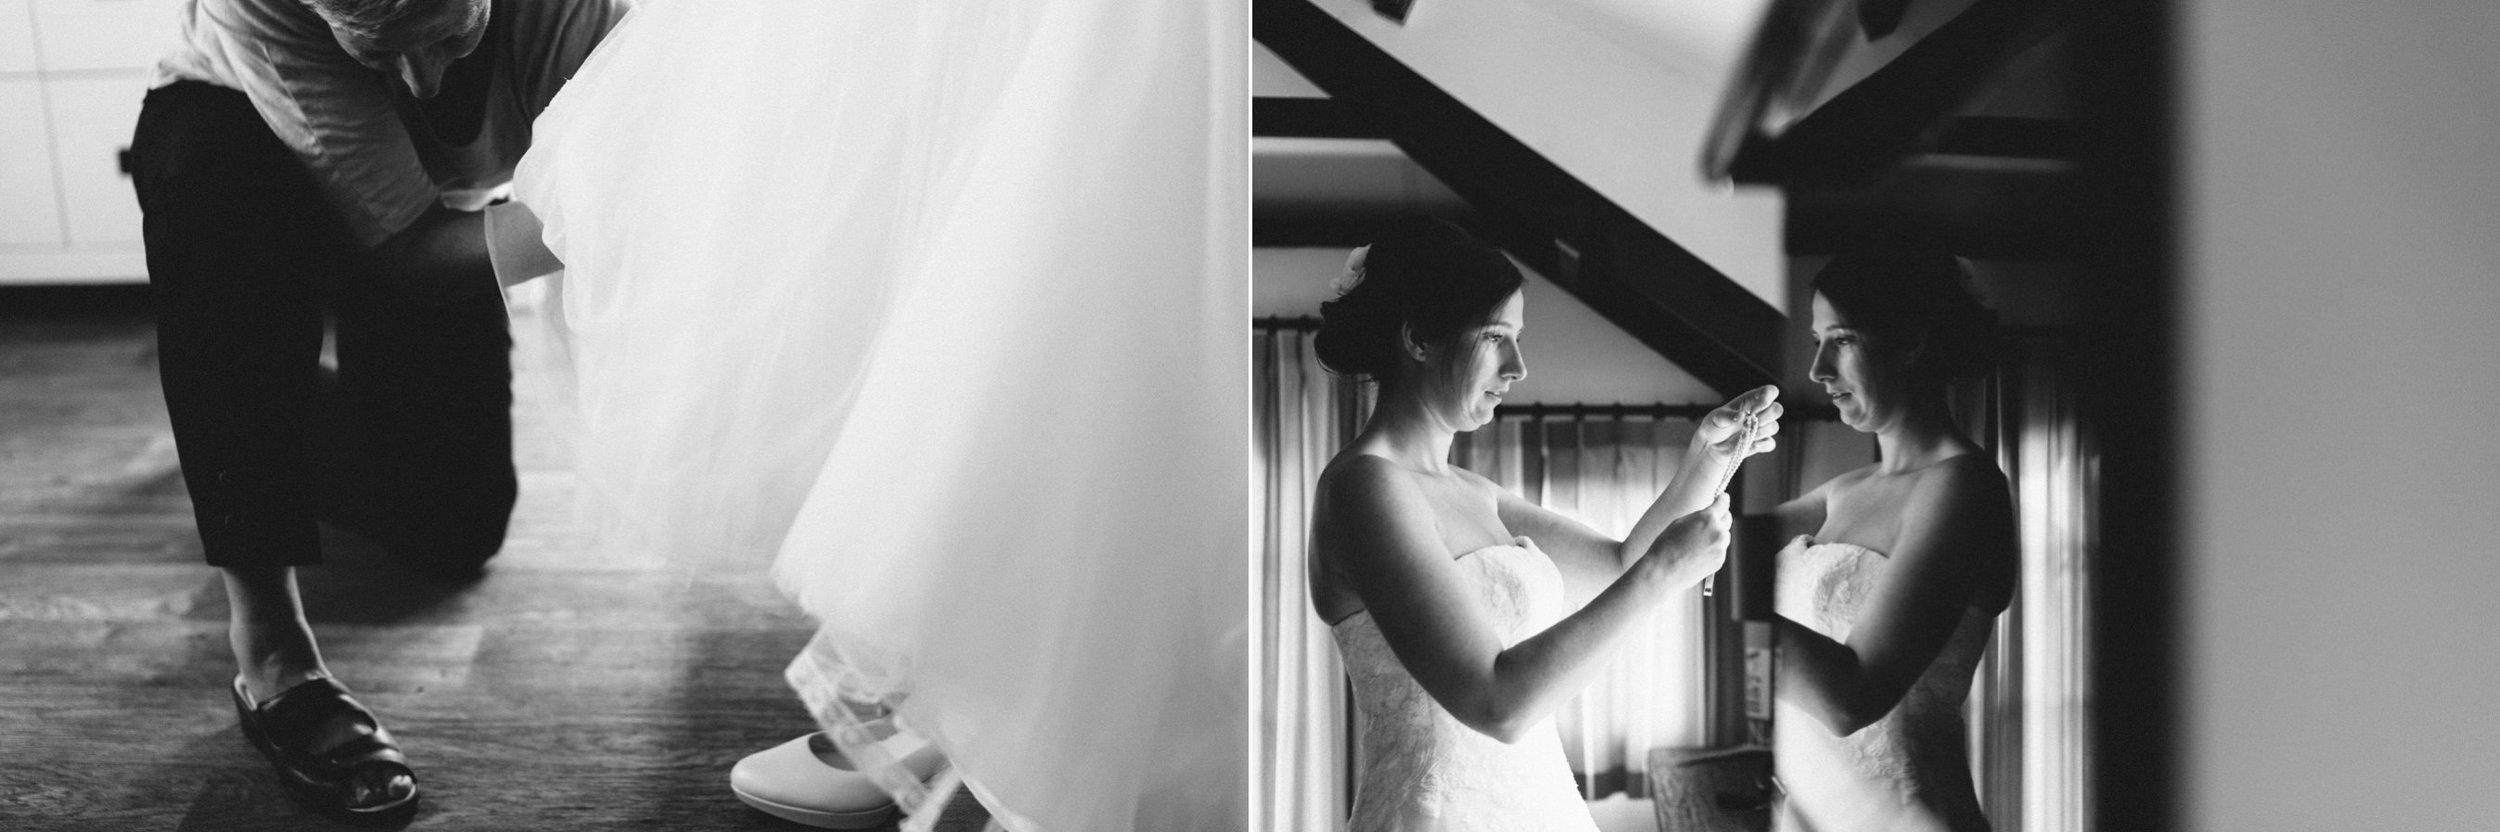 Bruidsfotografie-Terschelling-Michiel-Janette_0162.jpg